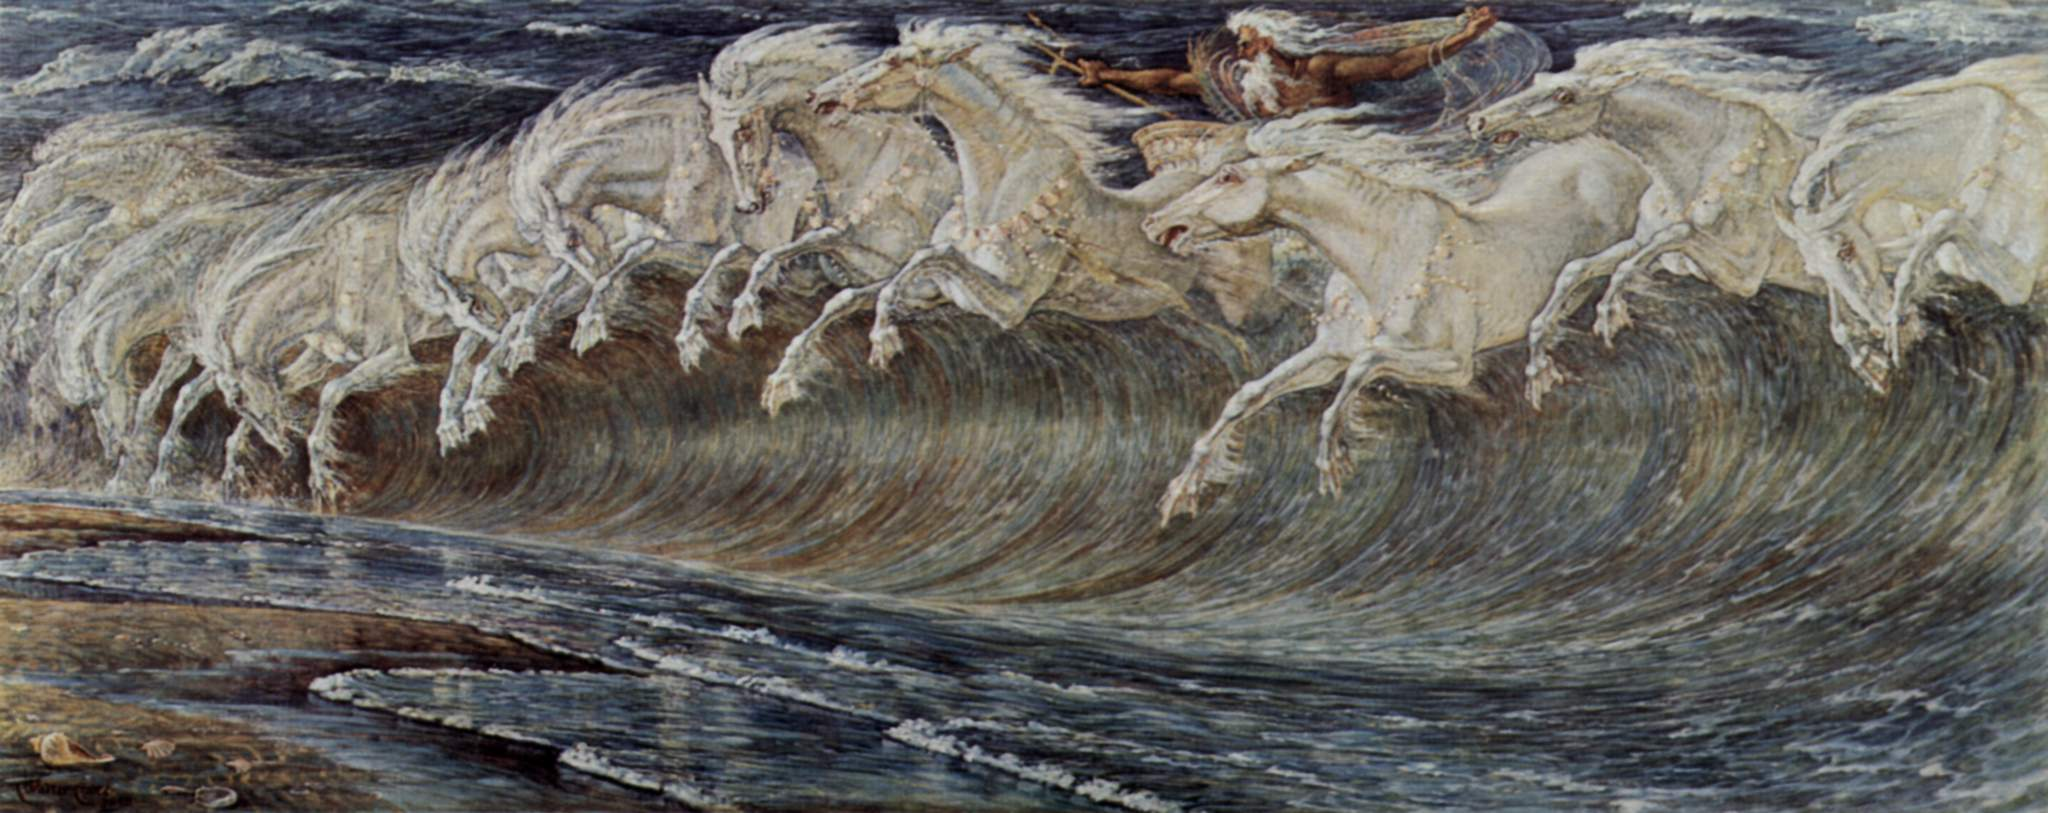 Walter Crane. Neptune's Horses (detalhe). 1882.